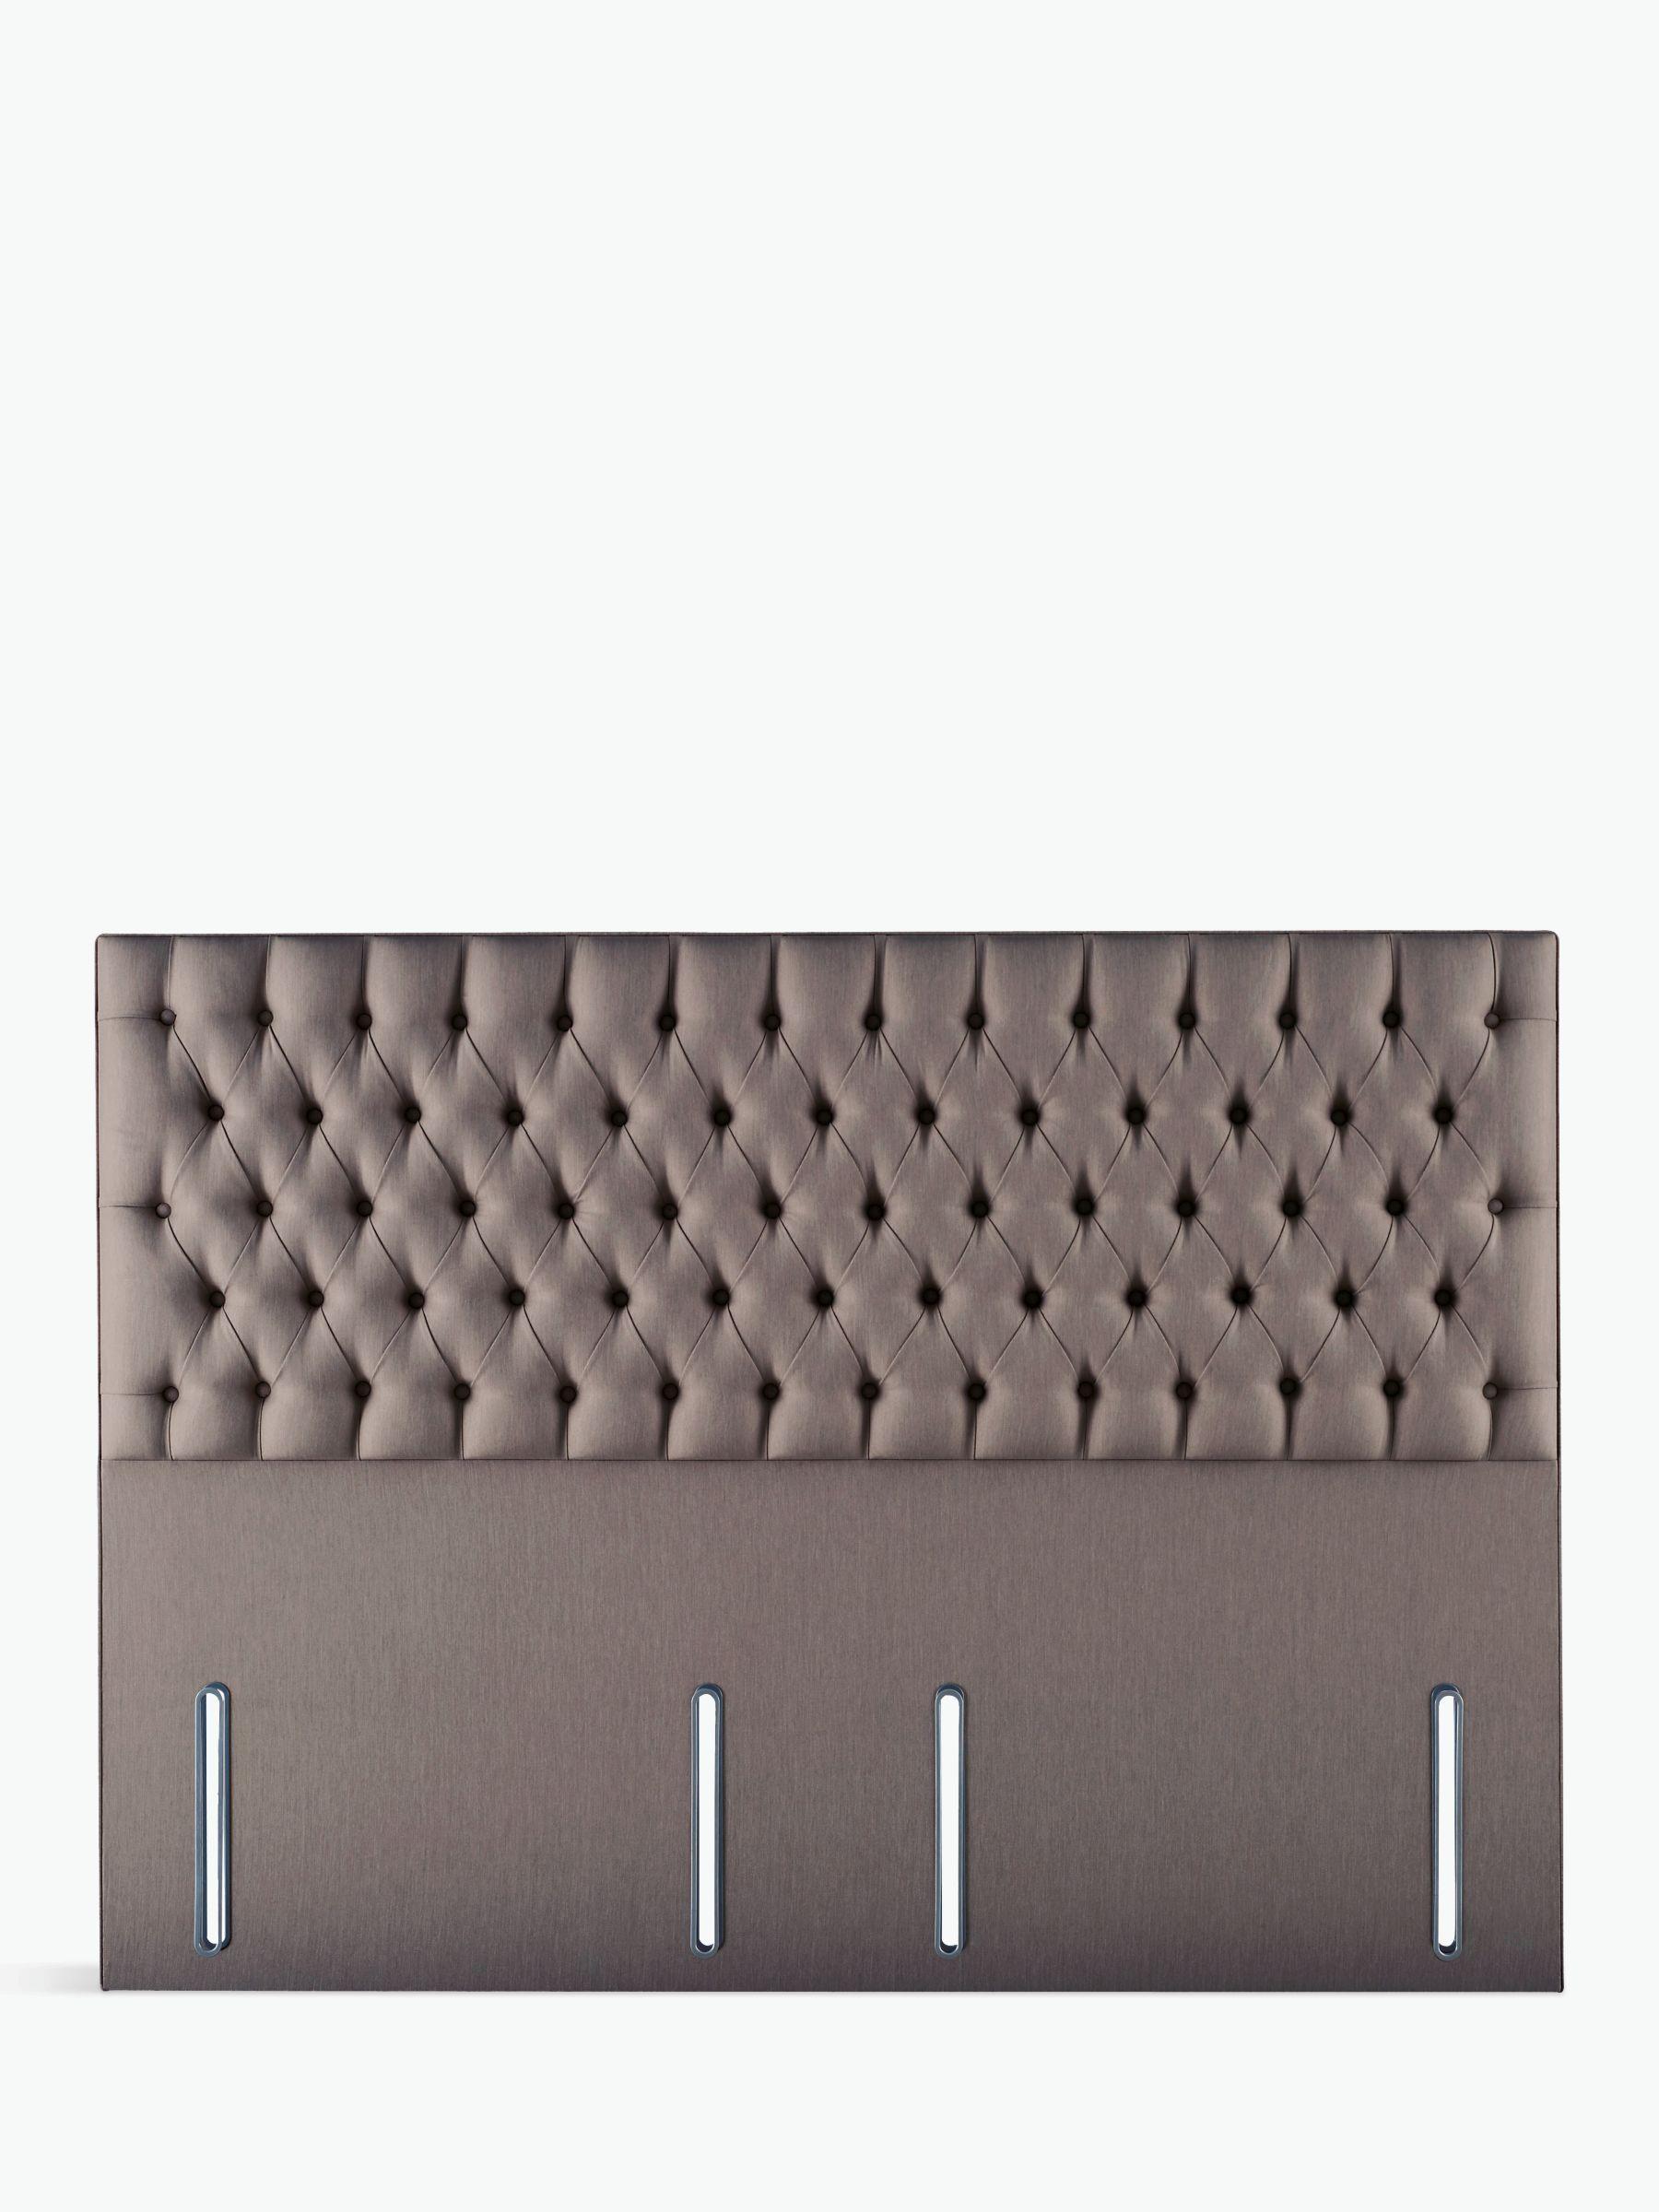 Hypnos Eleanor Full Depth Headboard Super King Size Imperio Grey